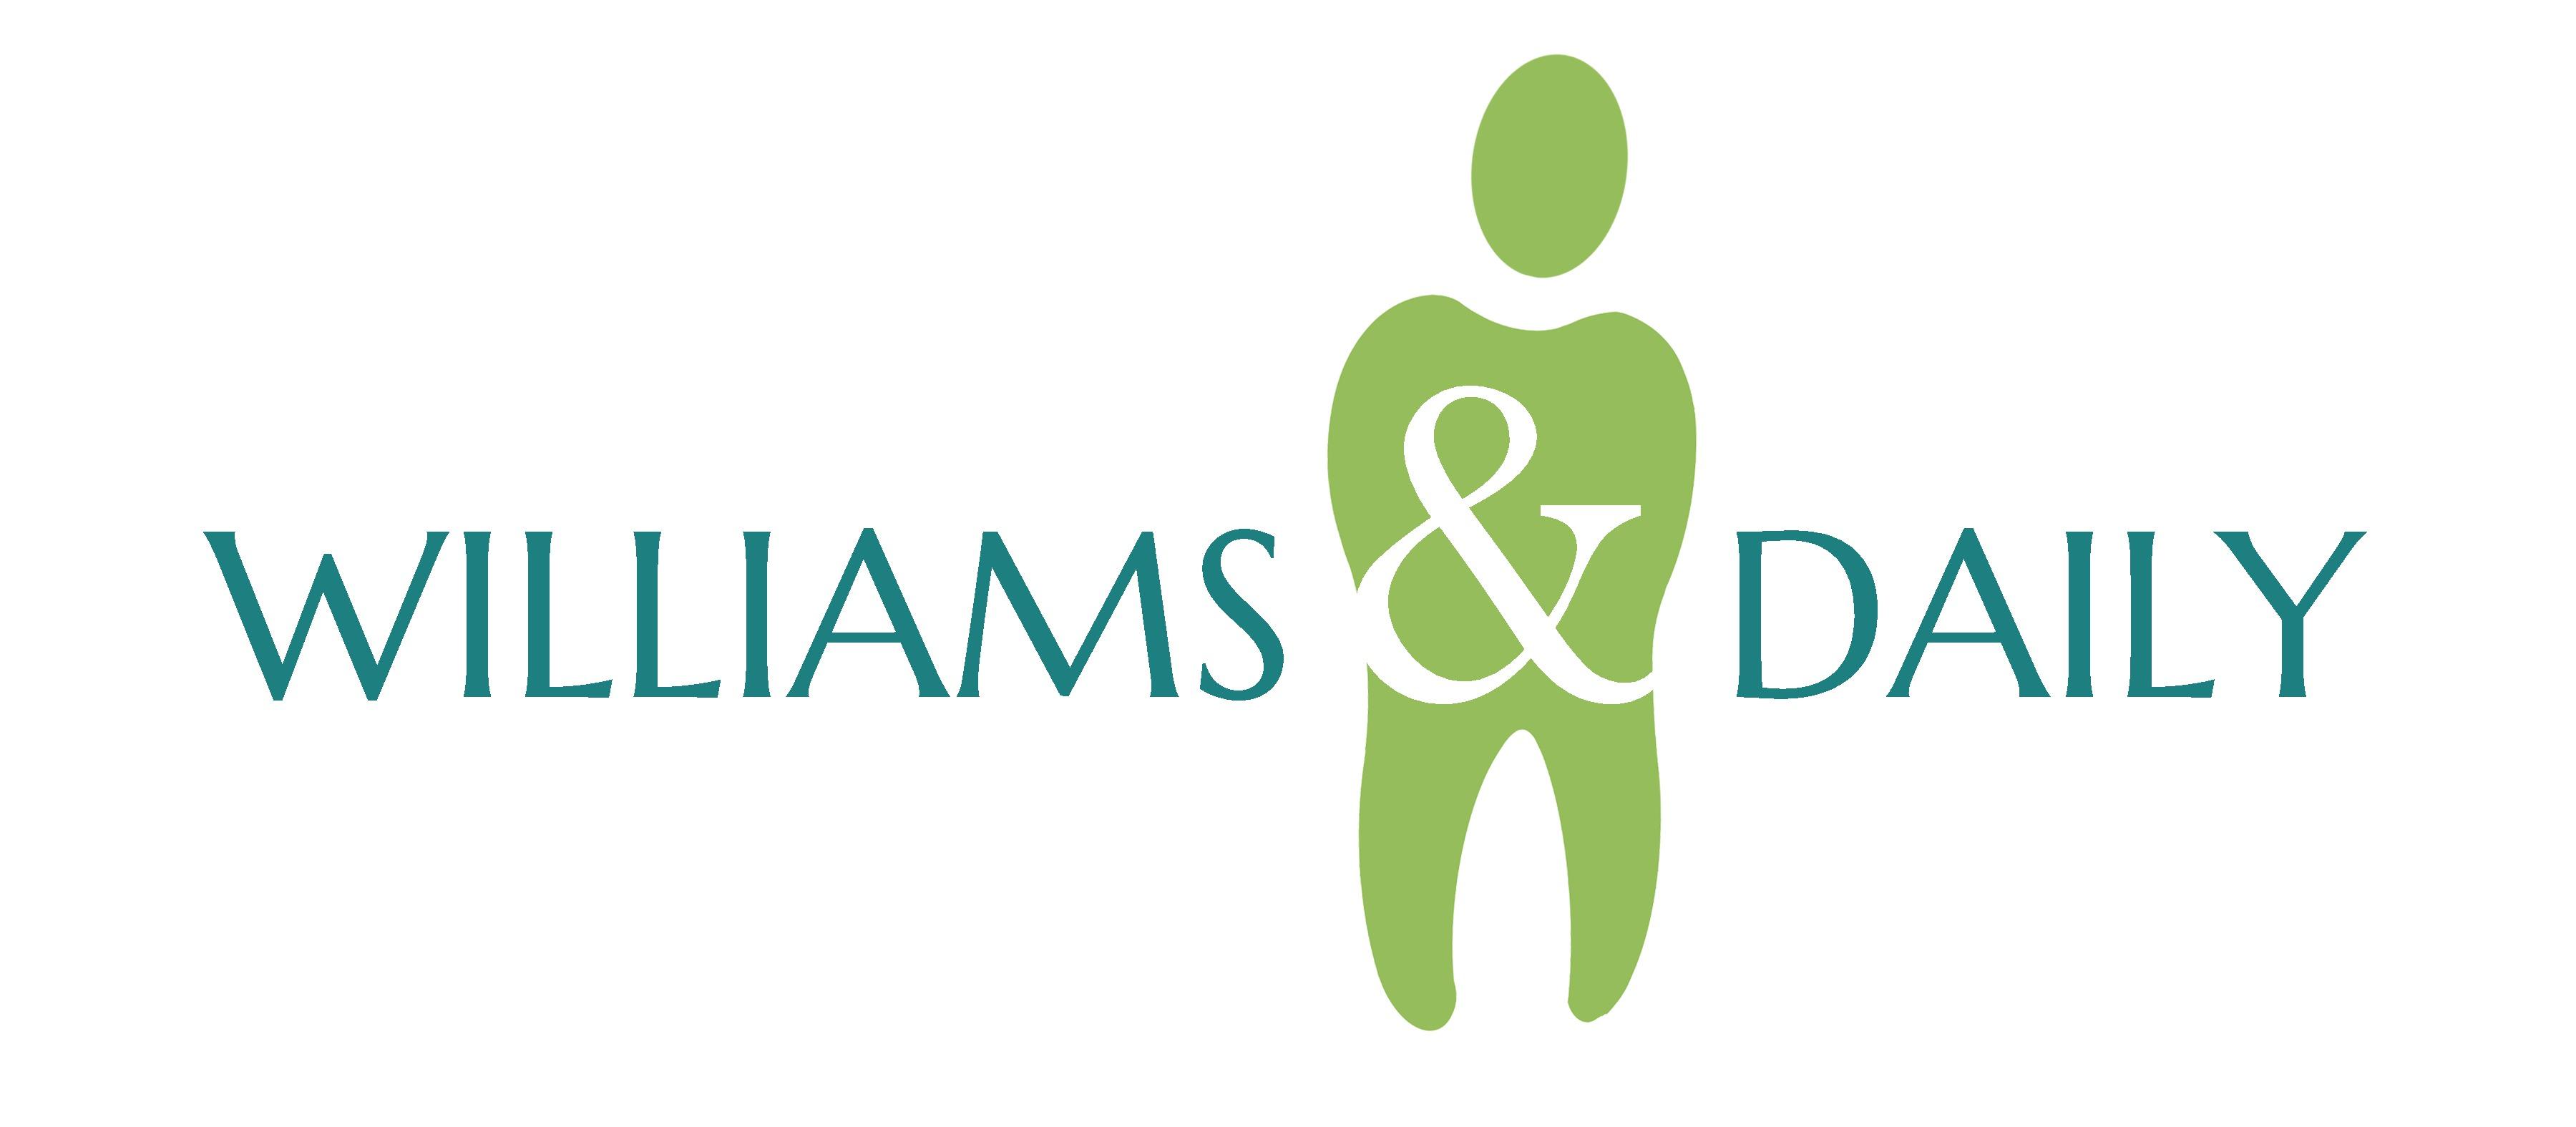 Sponsor Williams & Daily